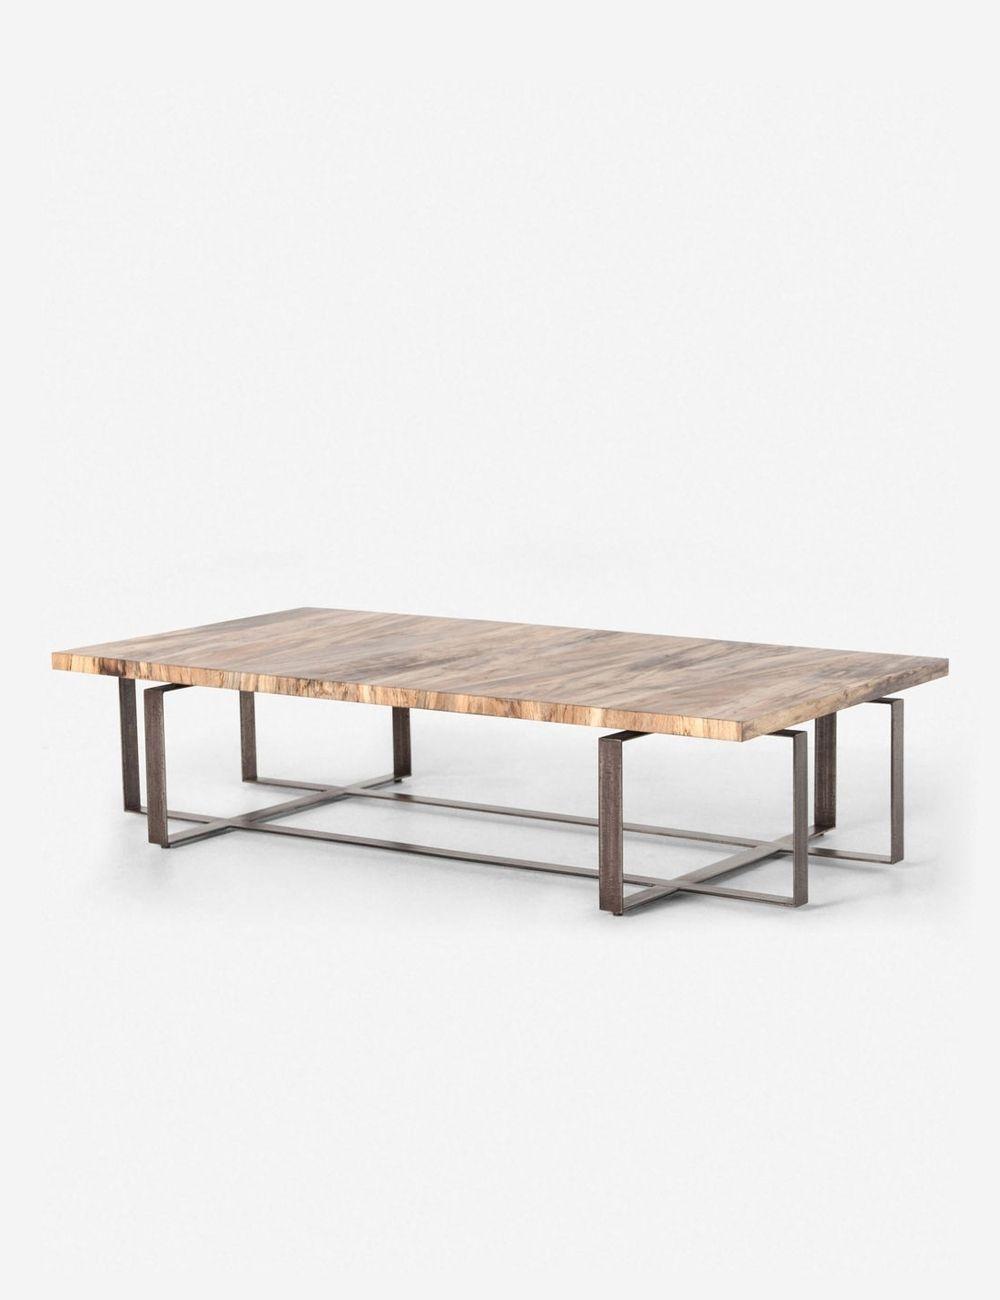 Dakira Coffee Table In 2021 Coffee Table Living Room Coffee Table Living Table [ 1300 x 1000 Pixel ]